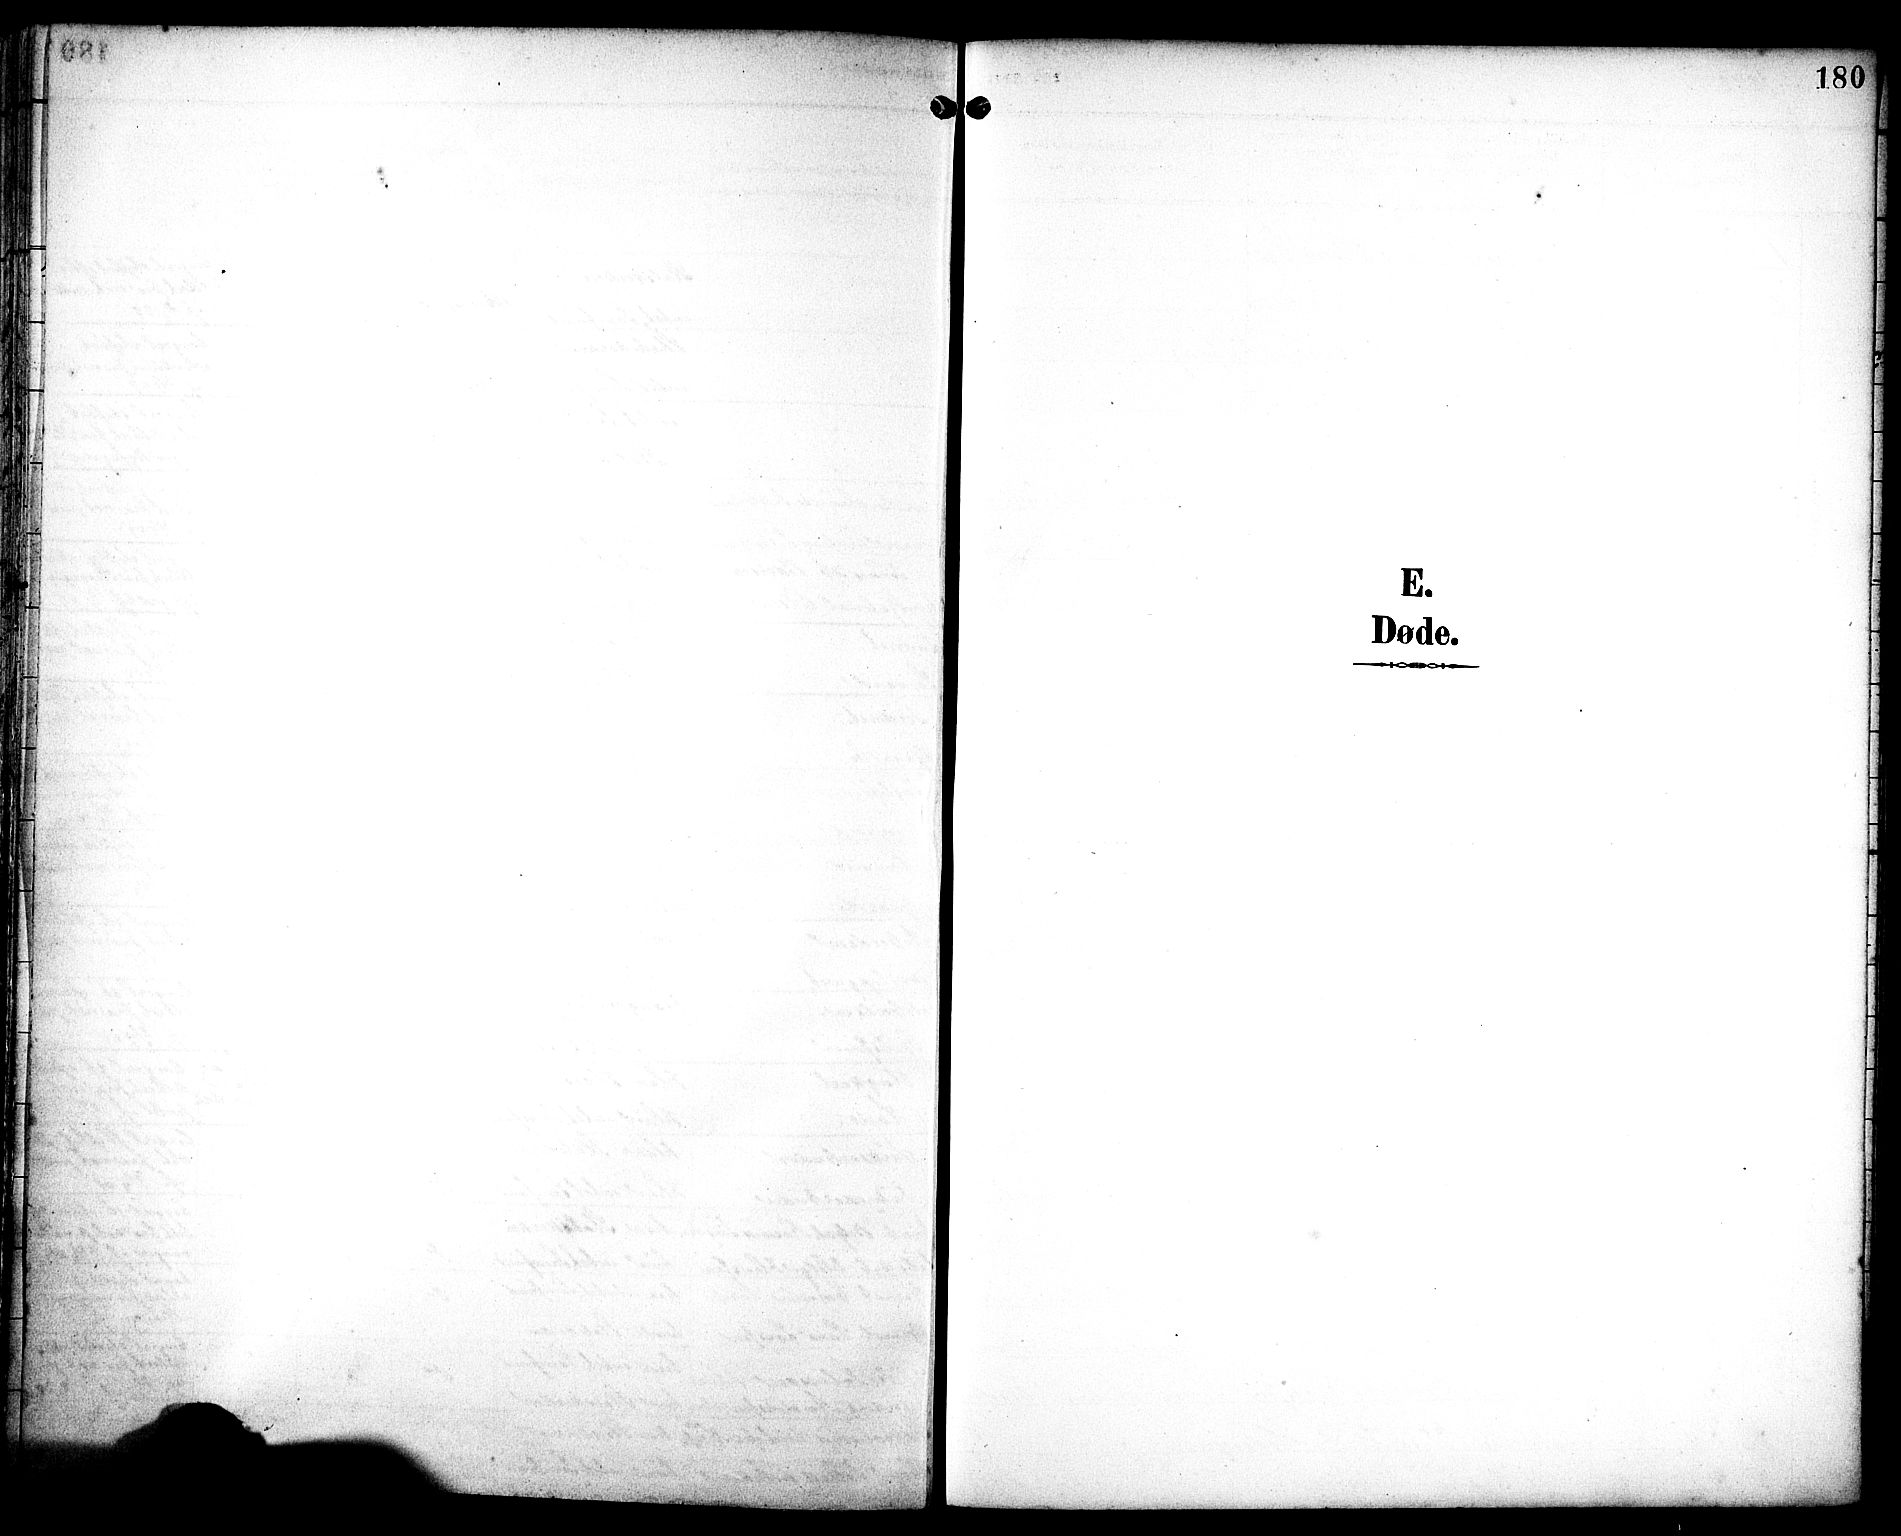 SAST, Egersund sokneprestkontor, Ministerialbok nr. A 18, 1892-1905, s. 180